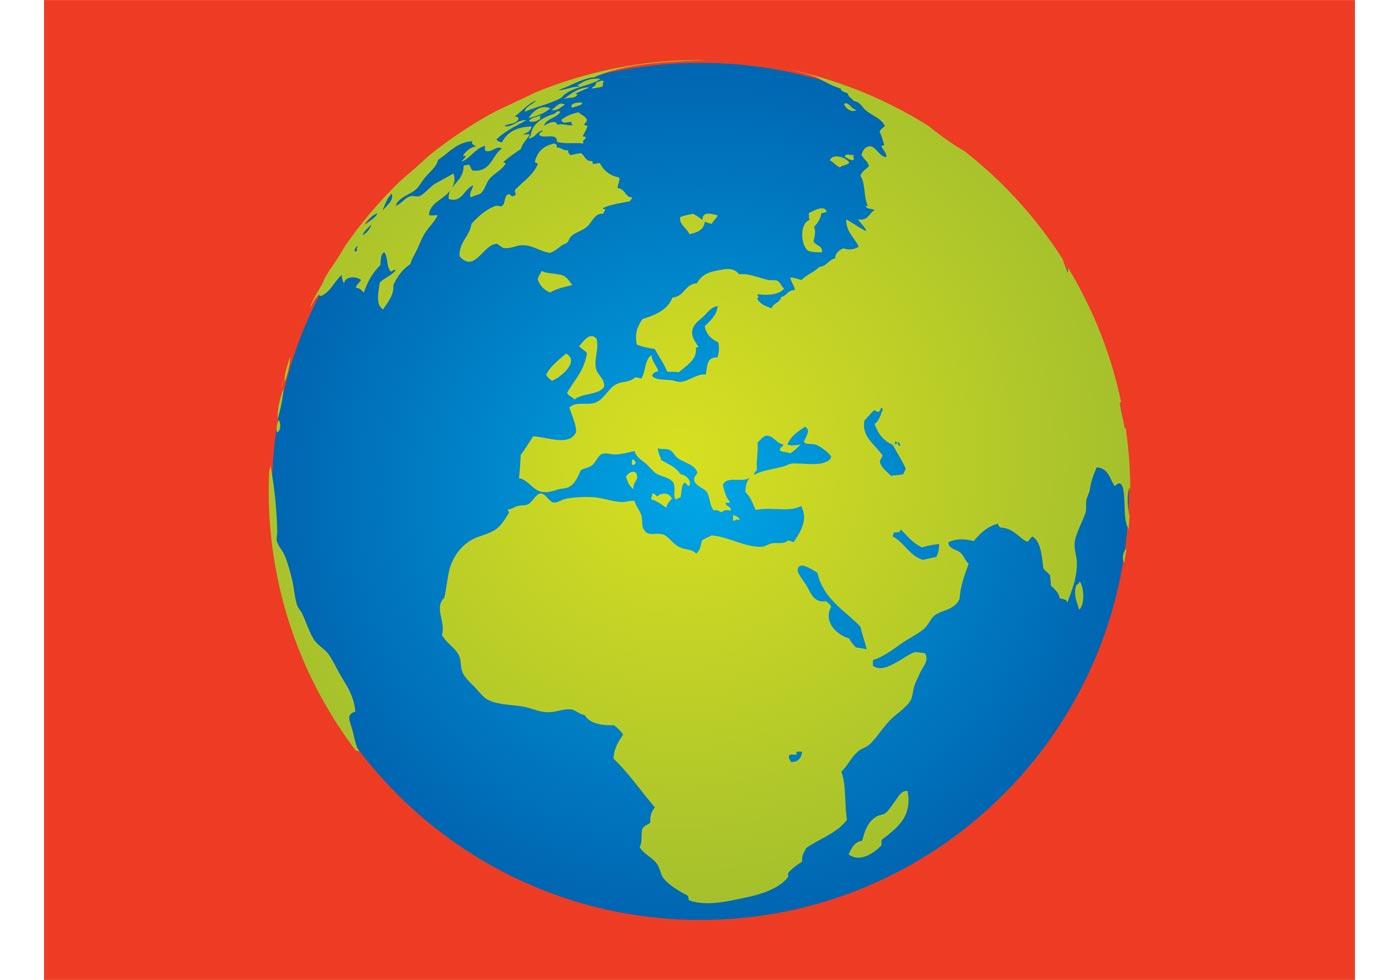 1400x980 Planet Earth Free Vector Art